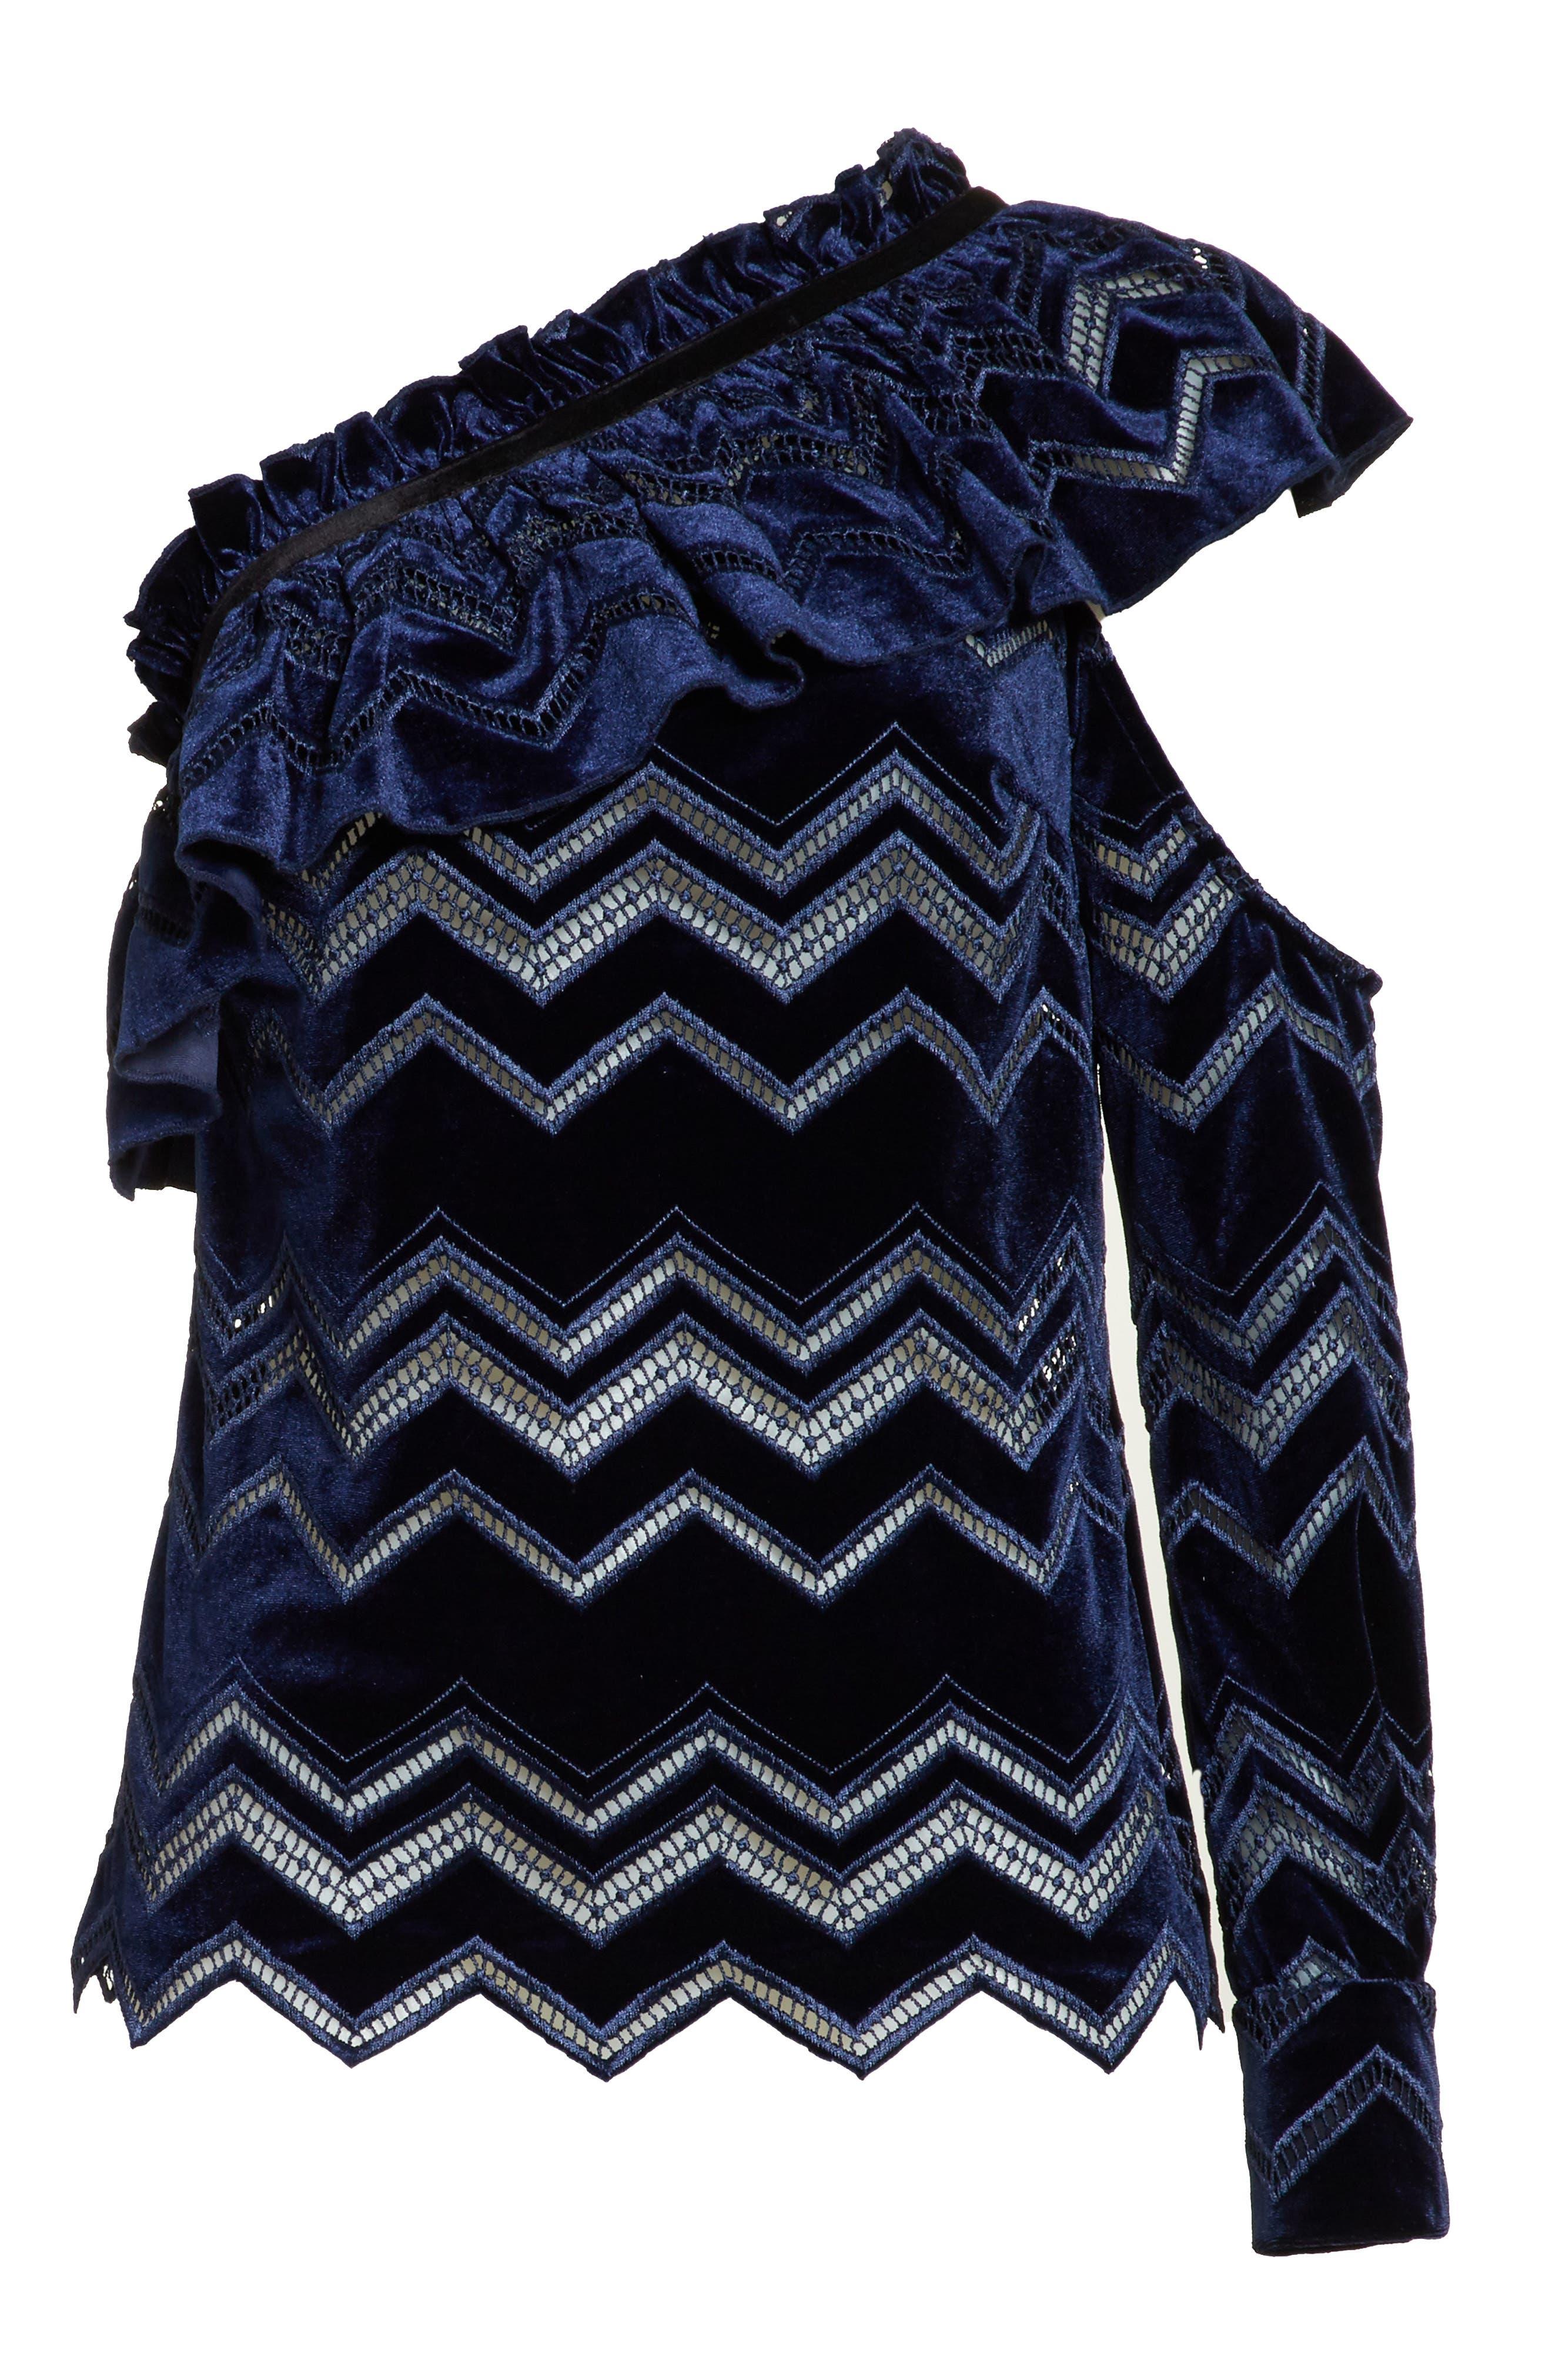 Zigzag Embroidered Velvet Top,                             Alternate thumbnail 6, color,                             Blue